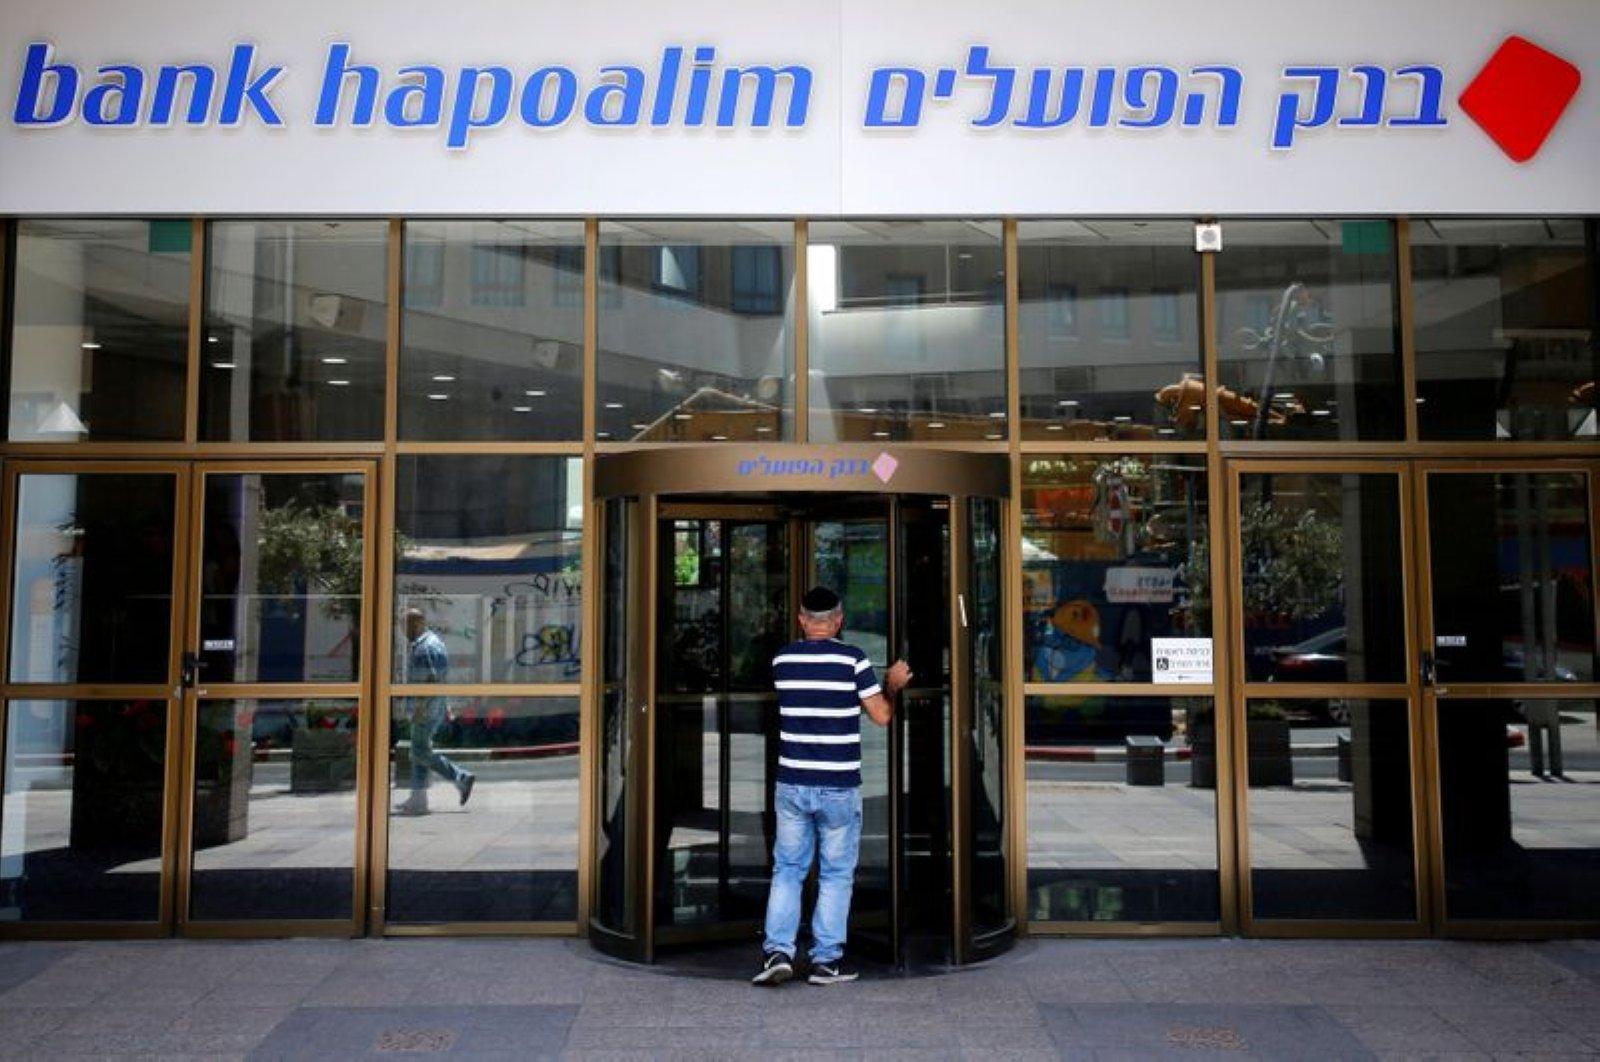 A man enters the main branch of Bank Hapoalim, in Tel Aviv, Israel July 18, 2016. (Reuters File Photo)